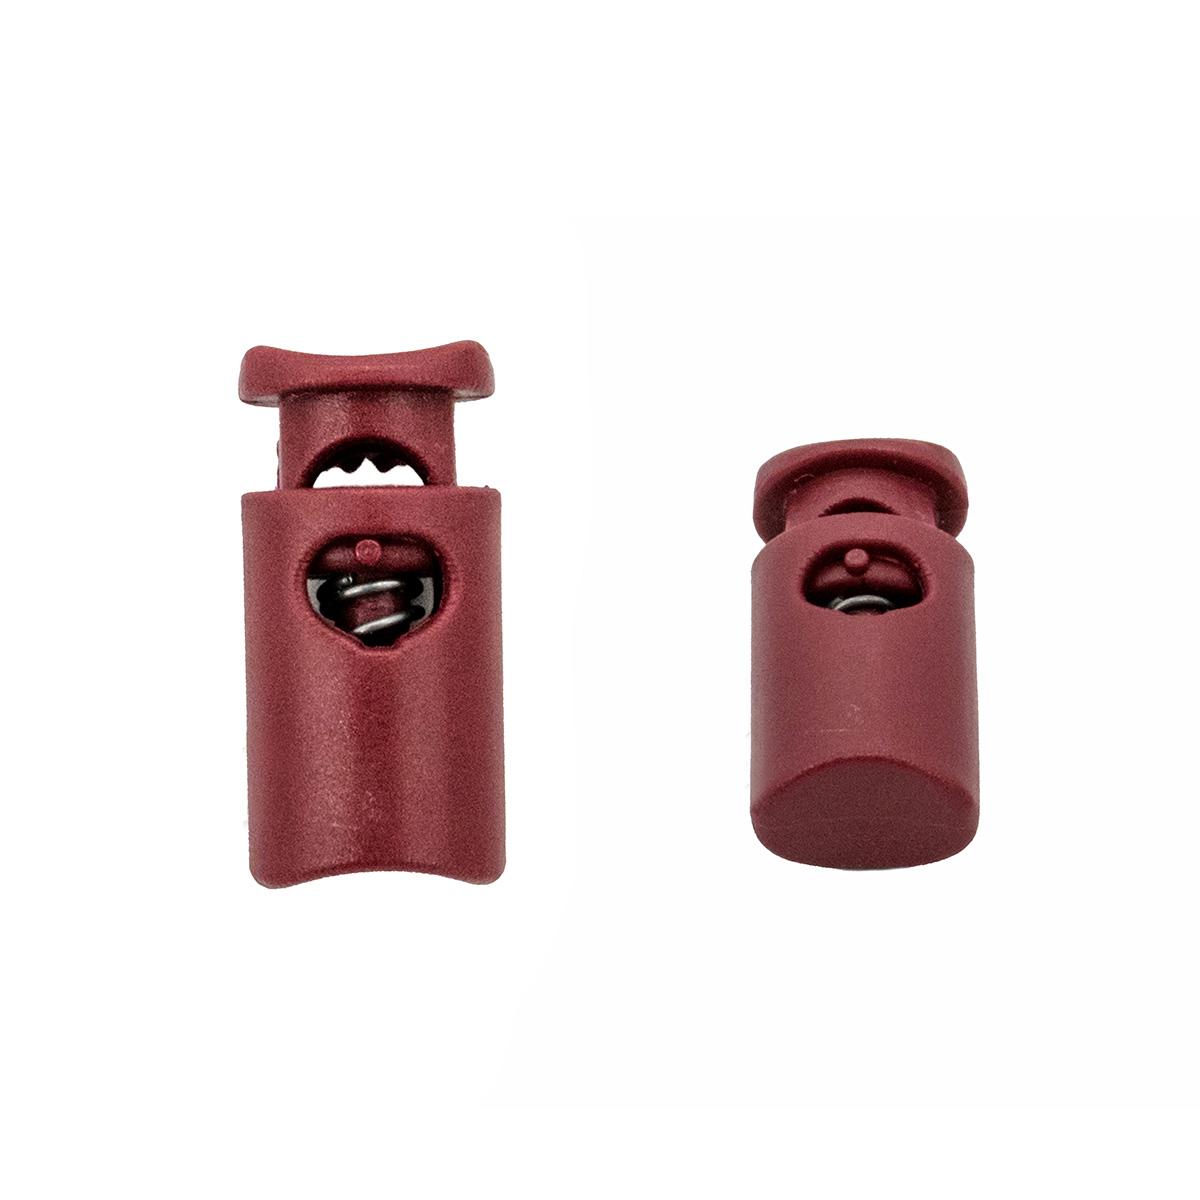 203-М Фиксатор (стопор) 'Цилиндр' d 4,5мм, 19*9мм, ПП,4шт пластик Hobby&PRO